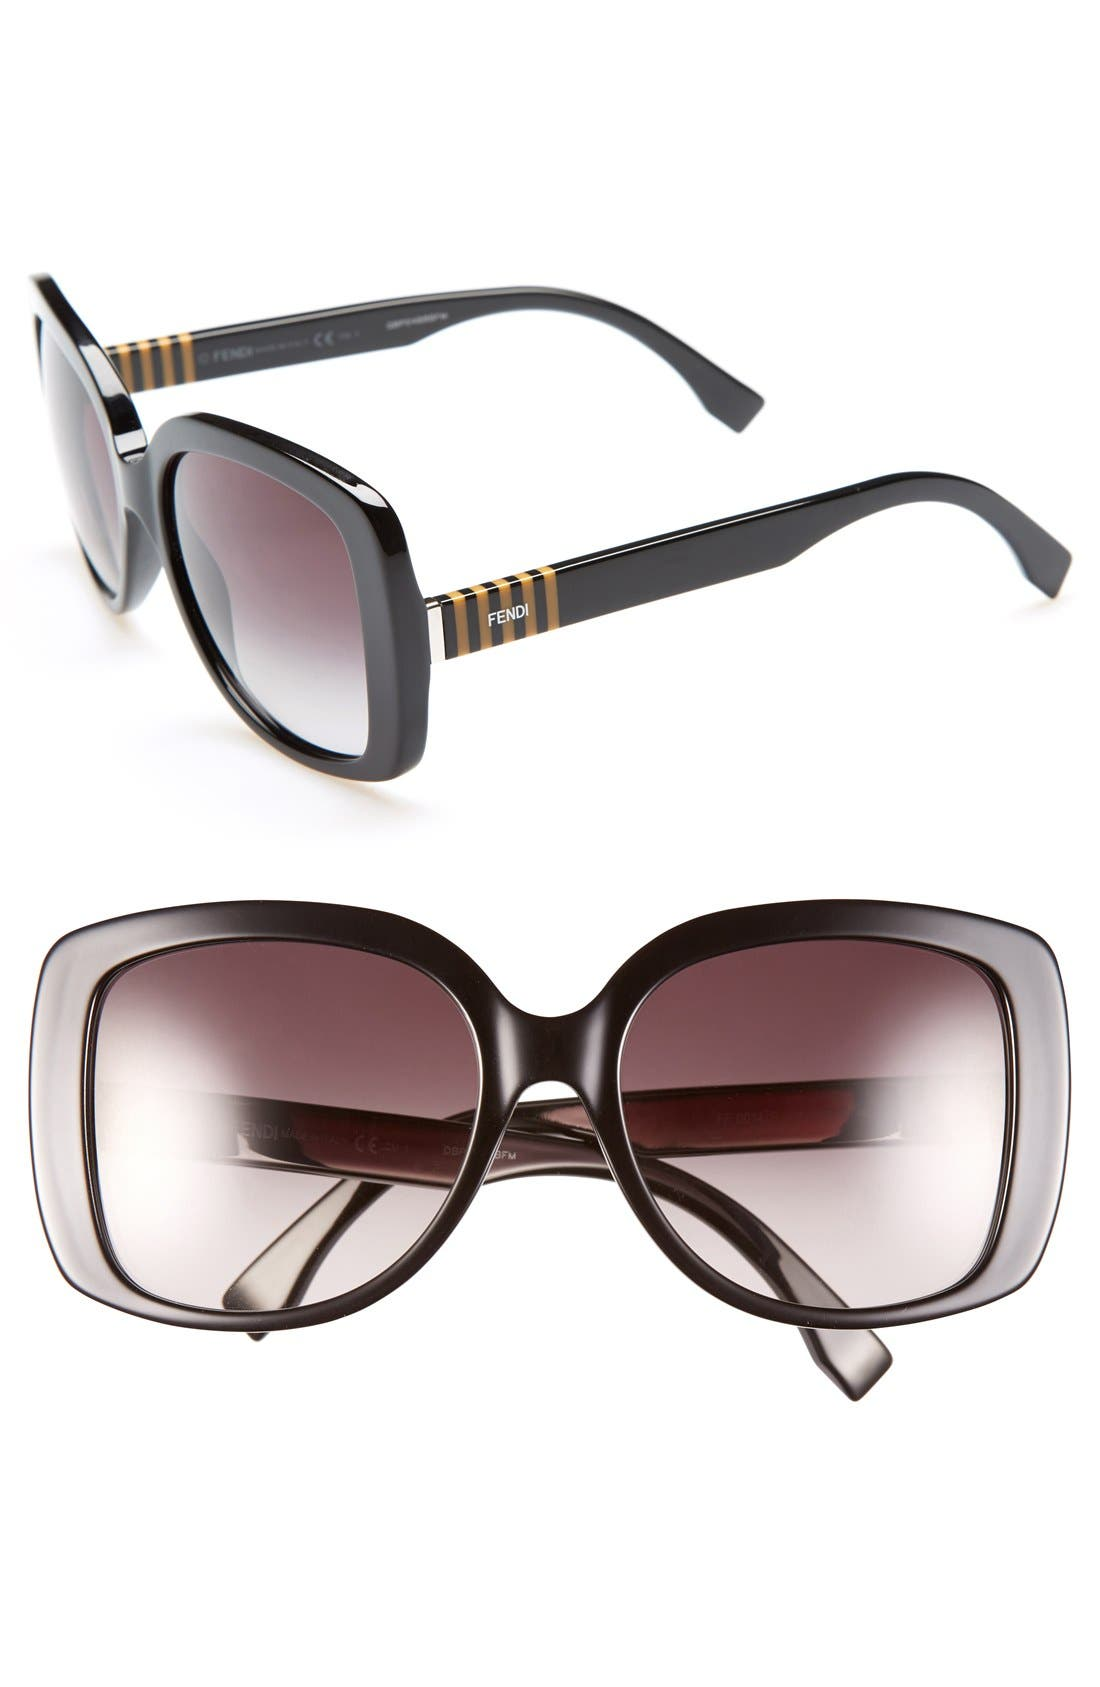 Alternate Image 1 Selected - Fendi 55mm Retro Sunglasses